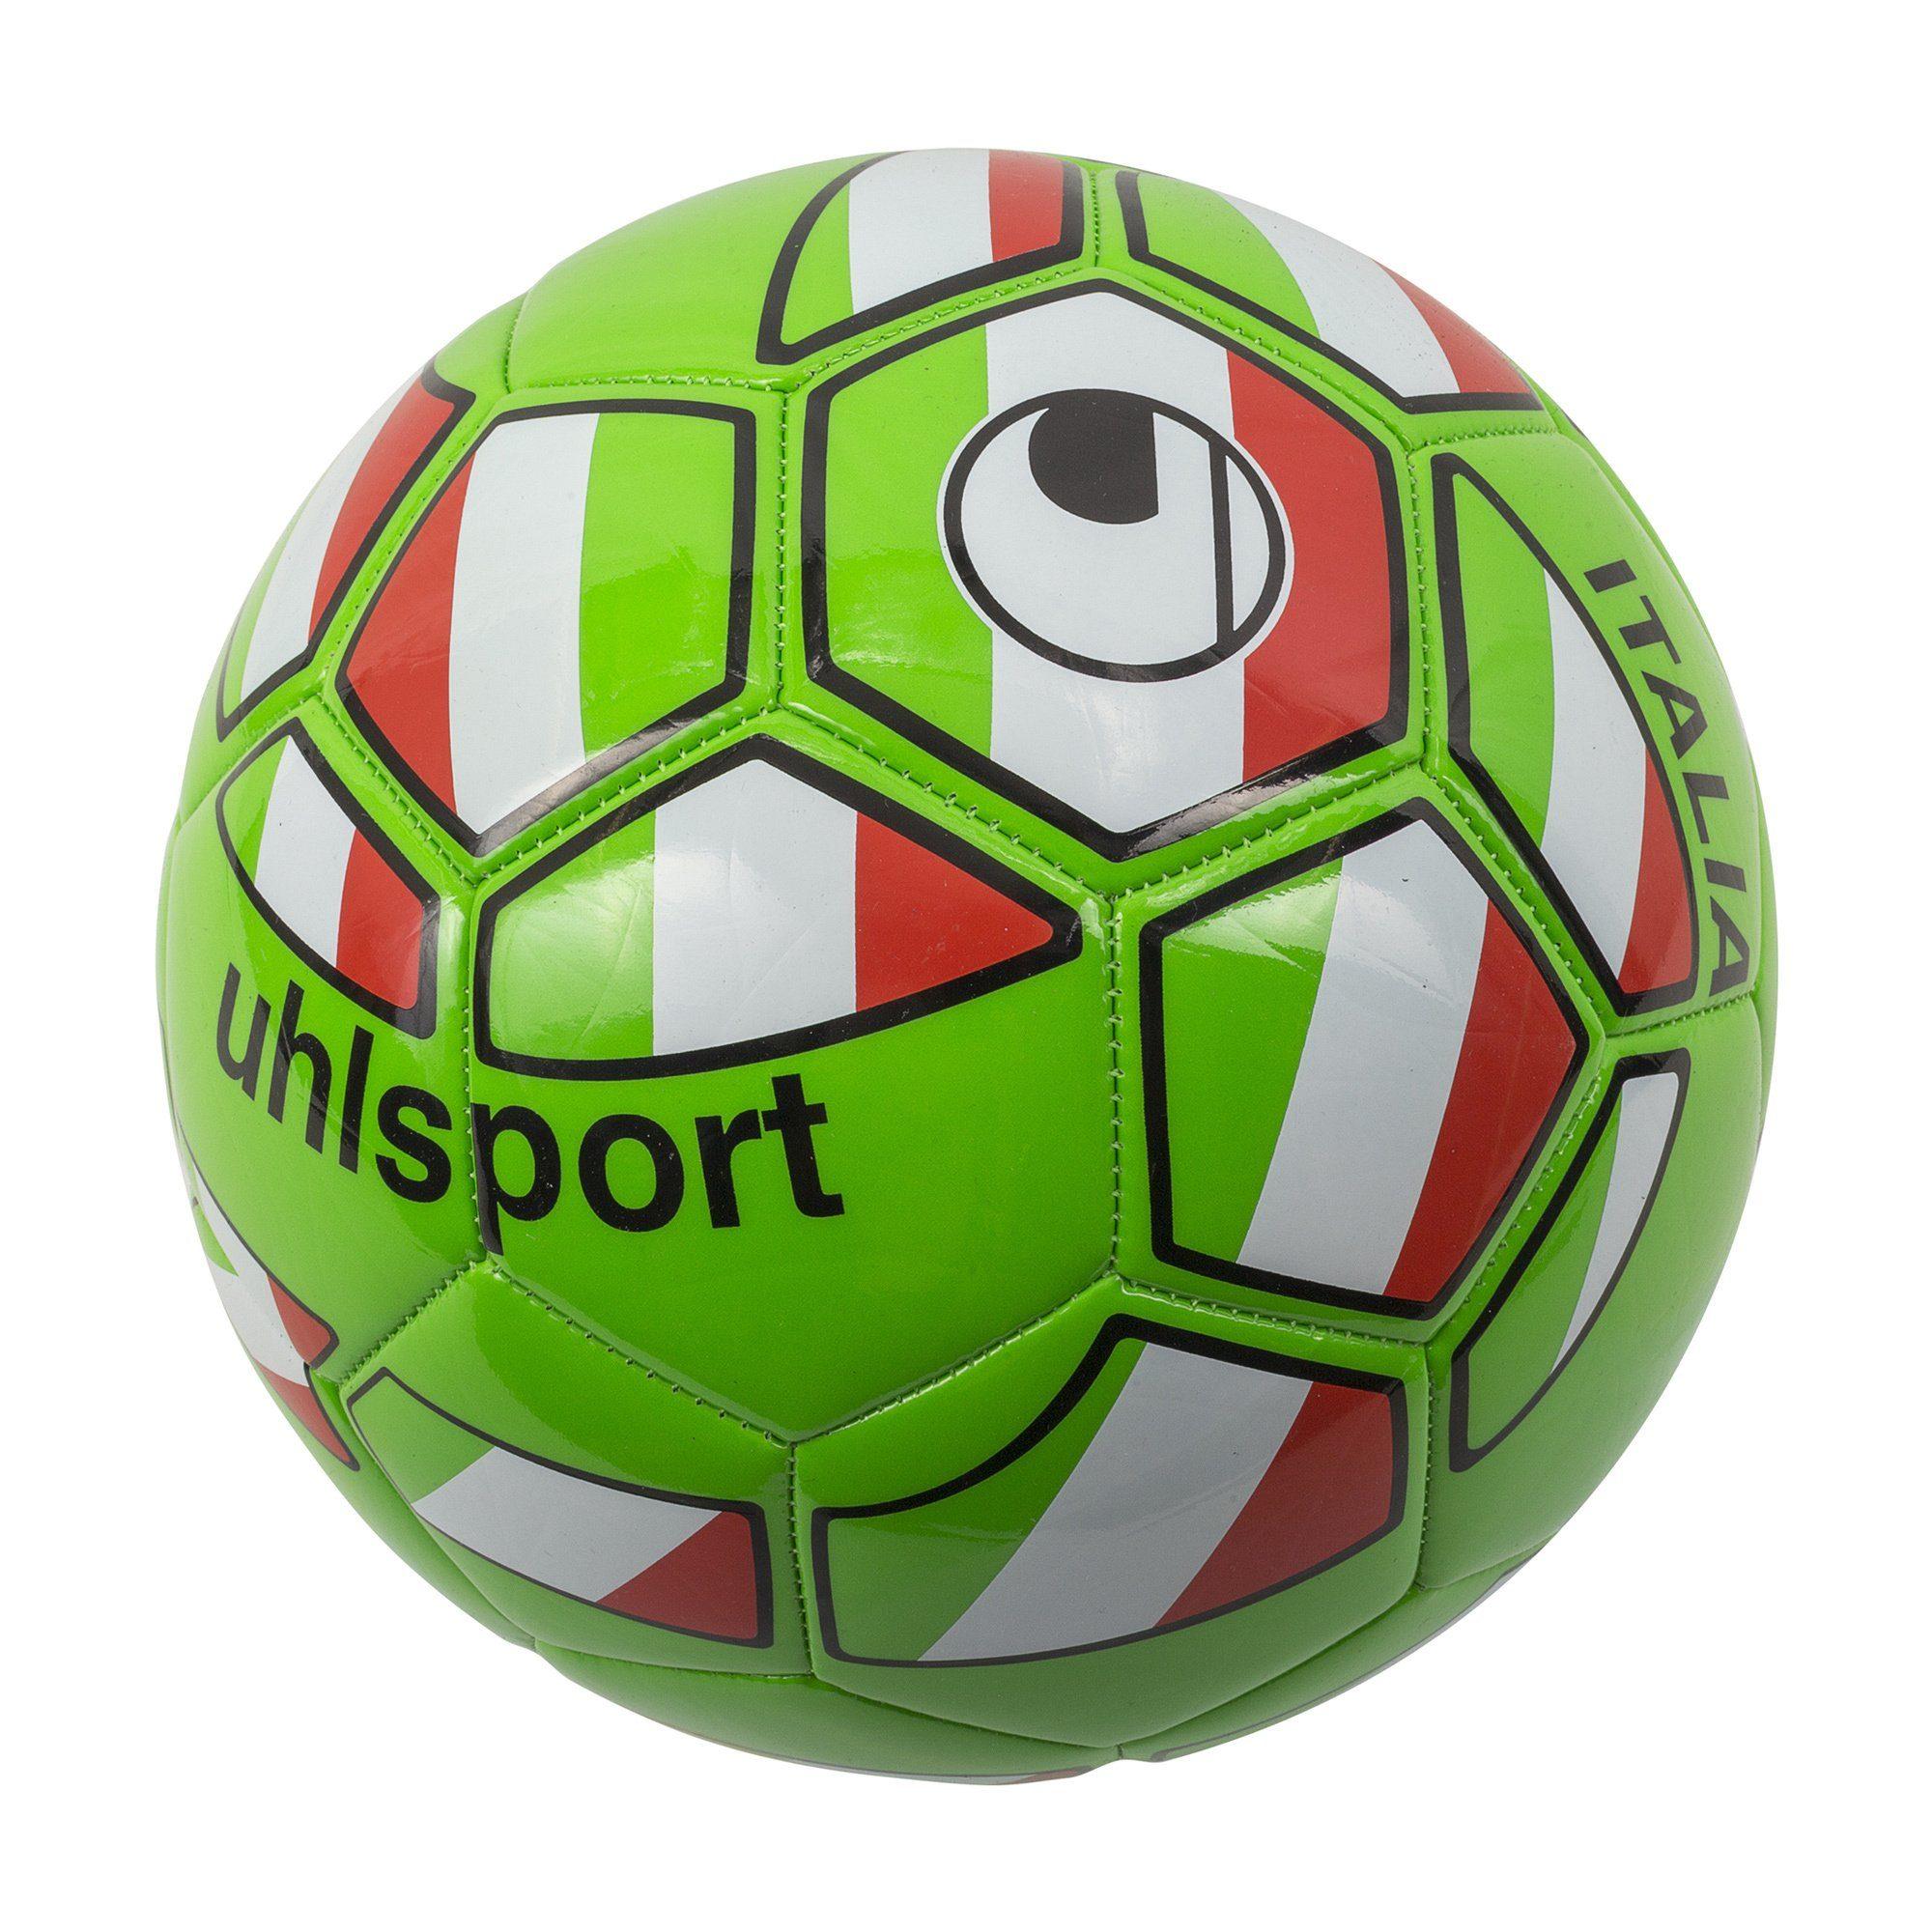 UHLSPORT Italien Mini Fußball